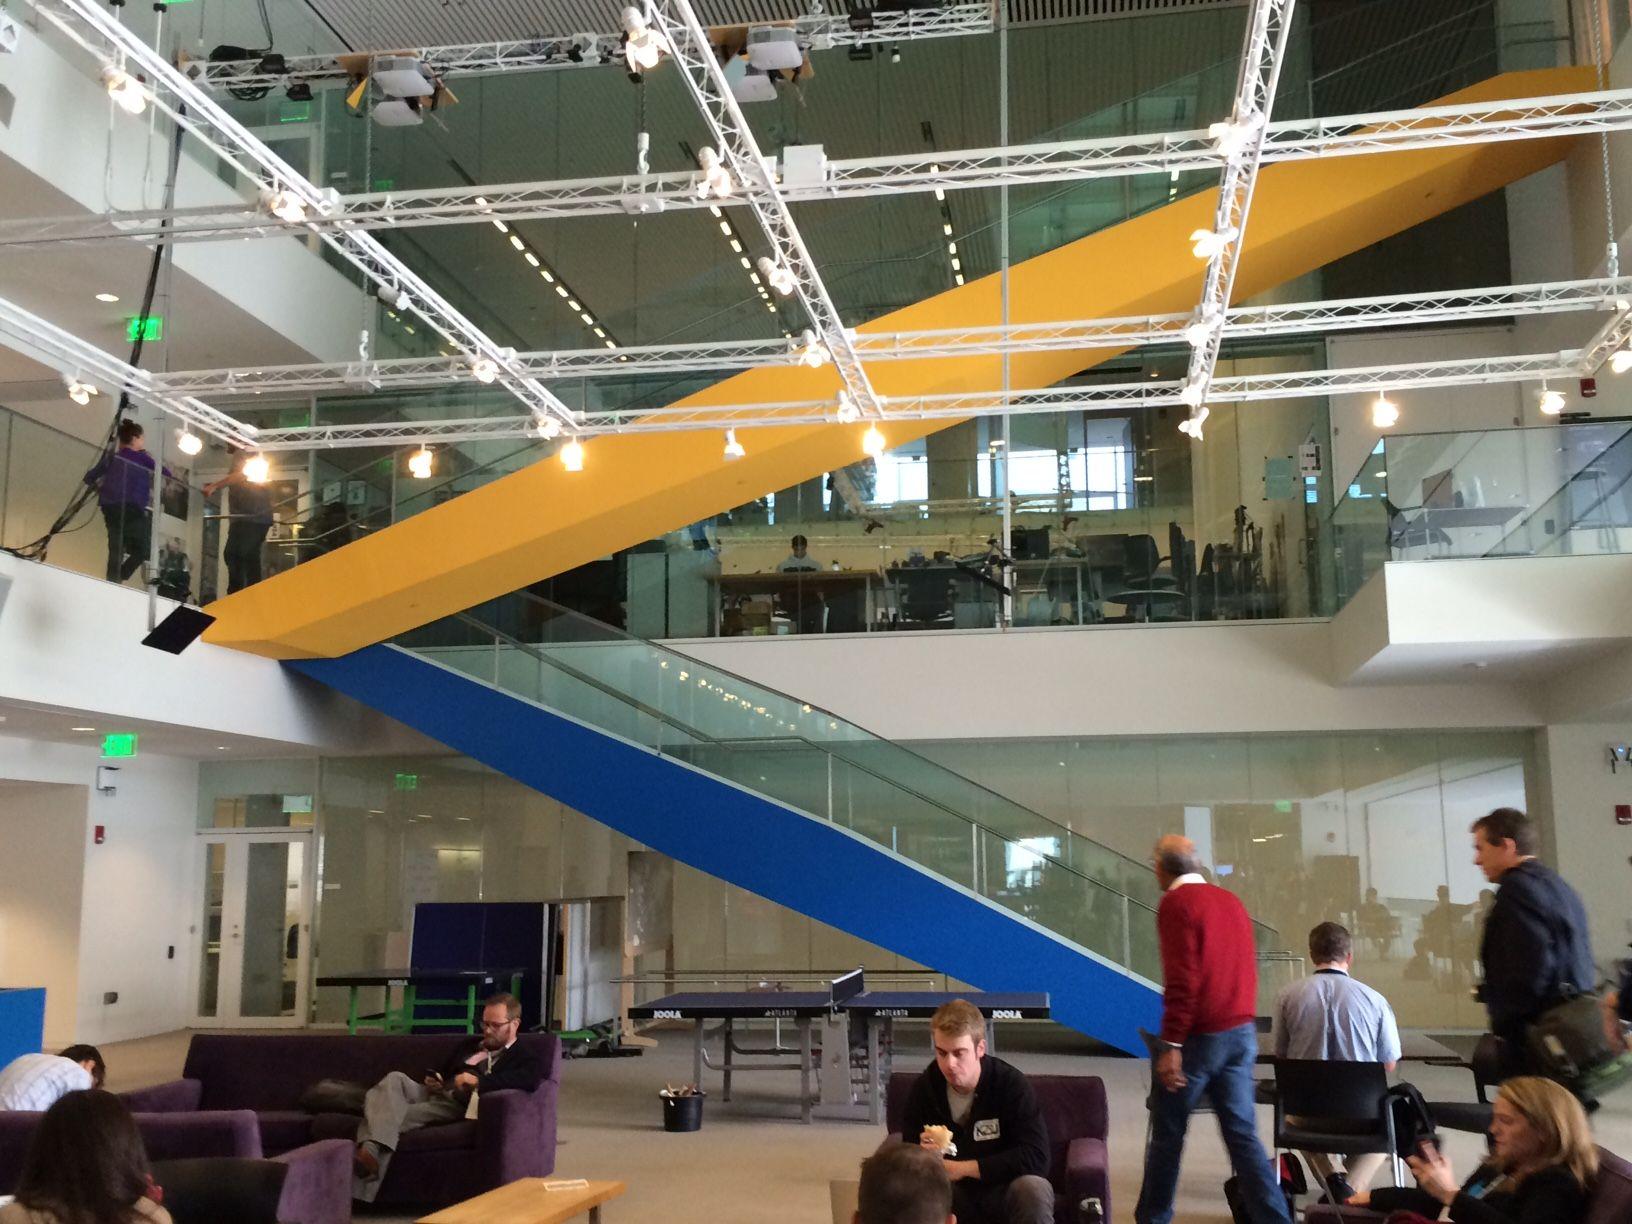 A Look Inside The Mit Media Lab Slideshow Massachusetts Institute Of Technology Media Innovation